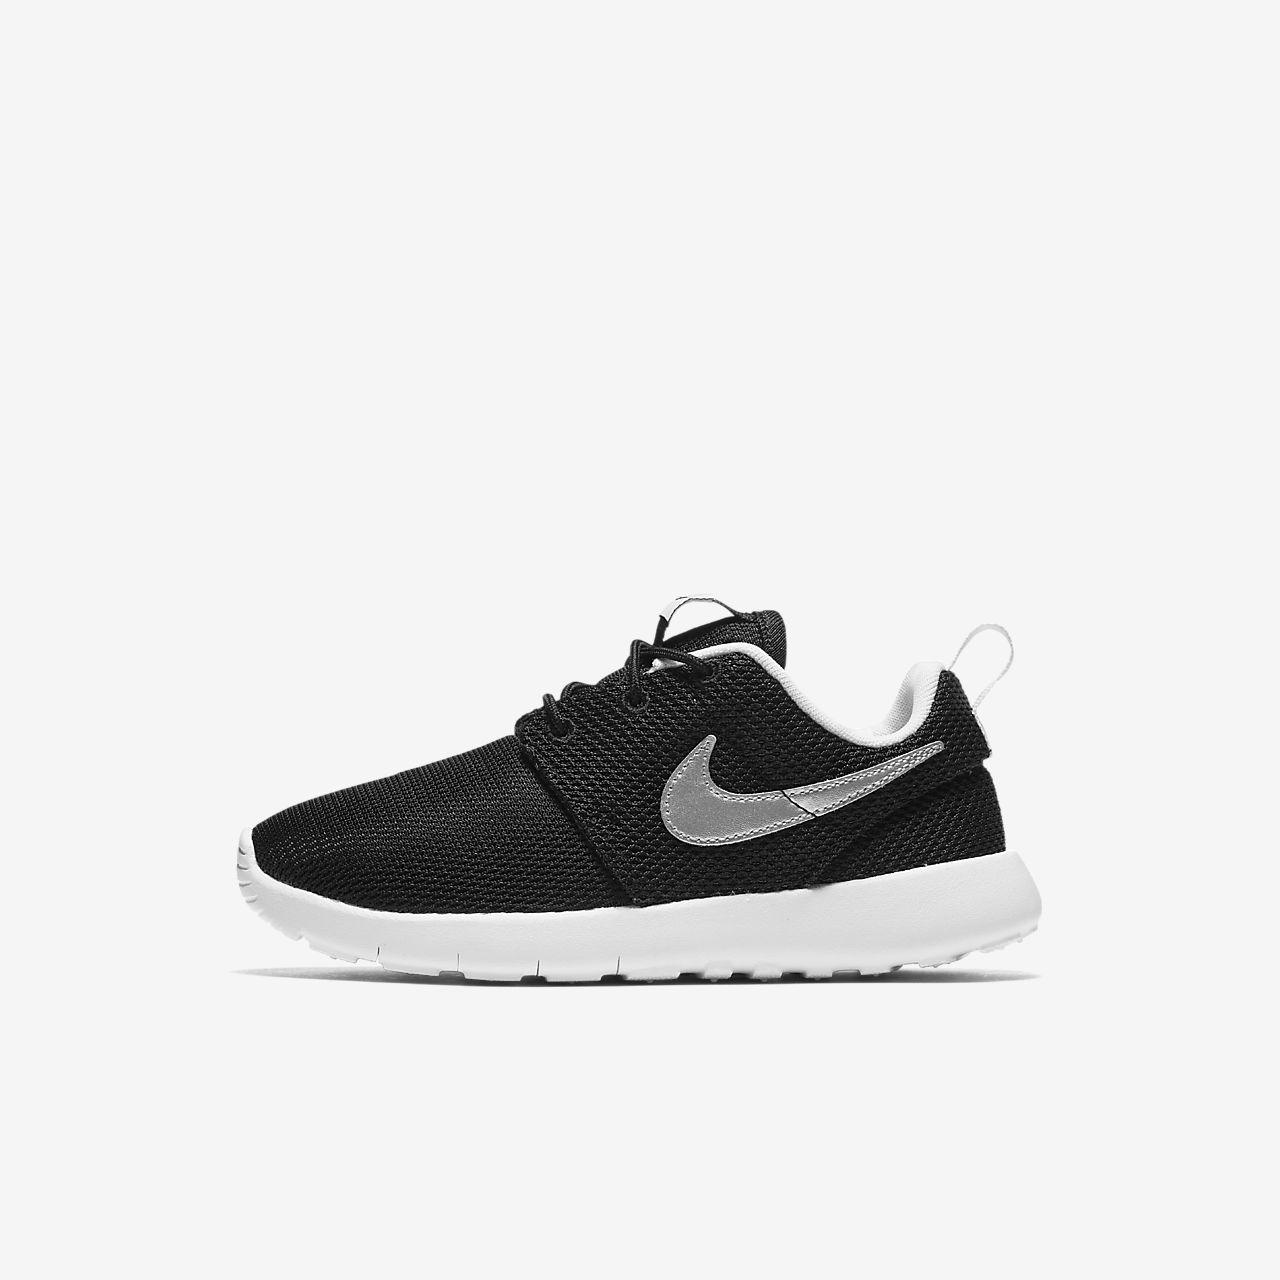 ... Chaussure Nike Roshe One pour Jeune enfant